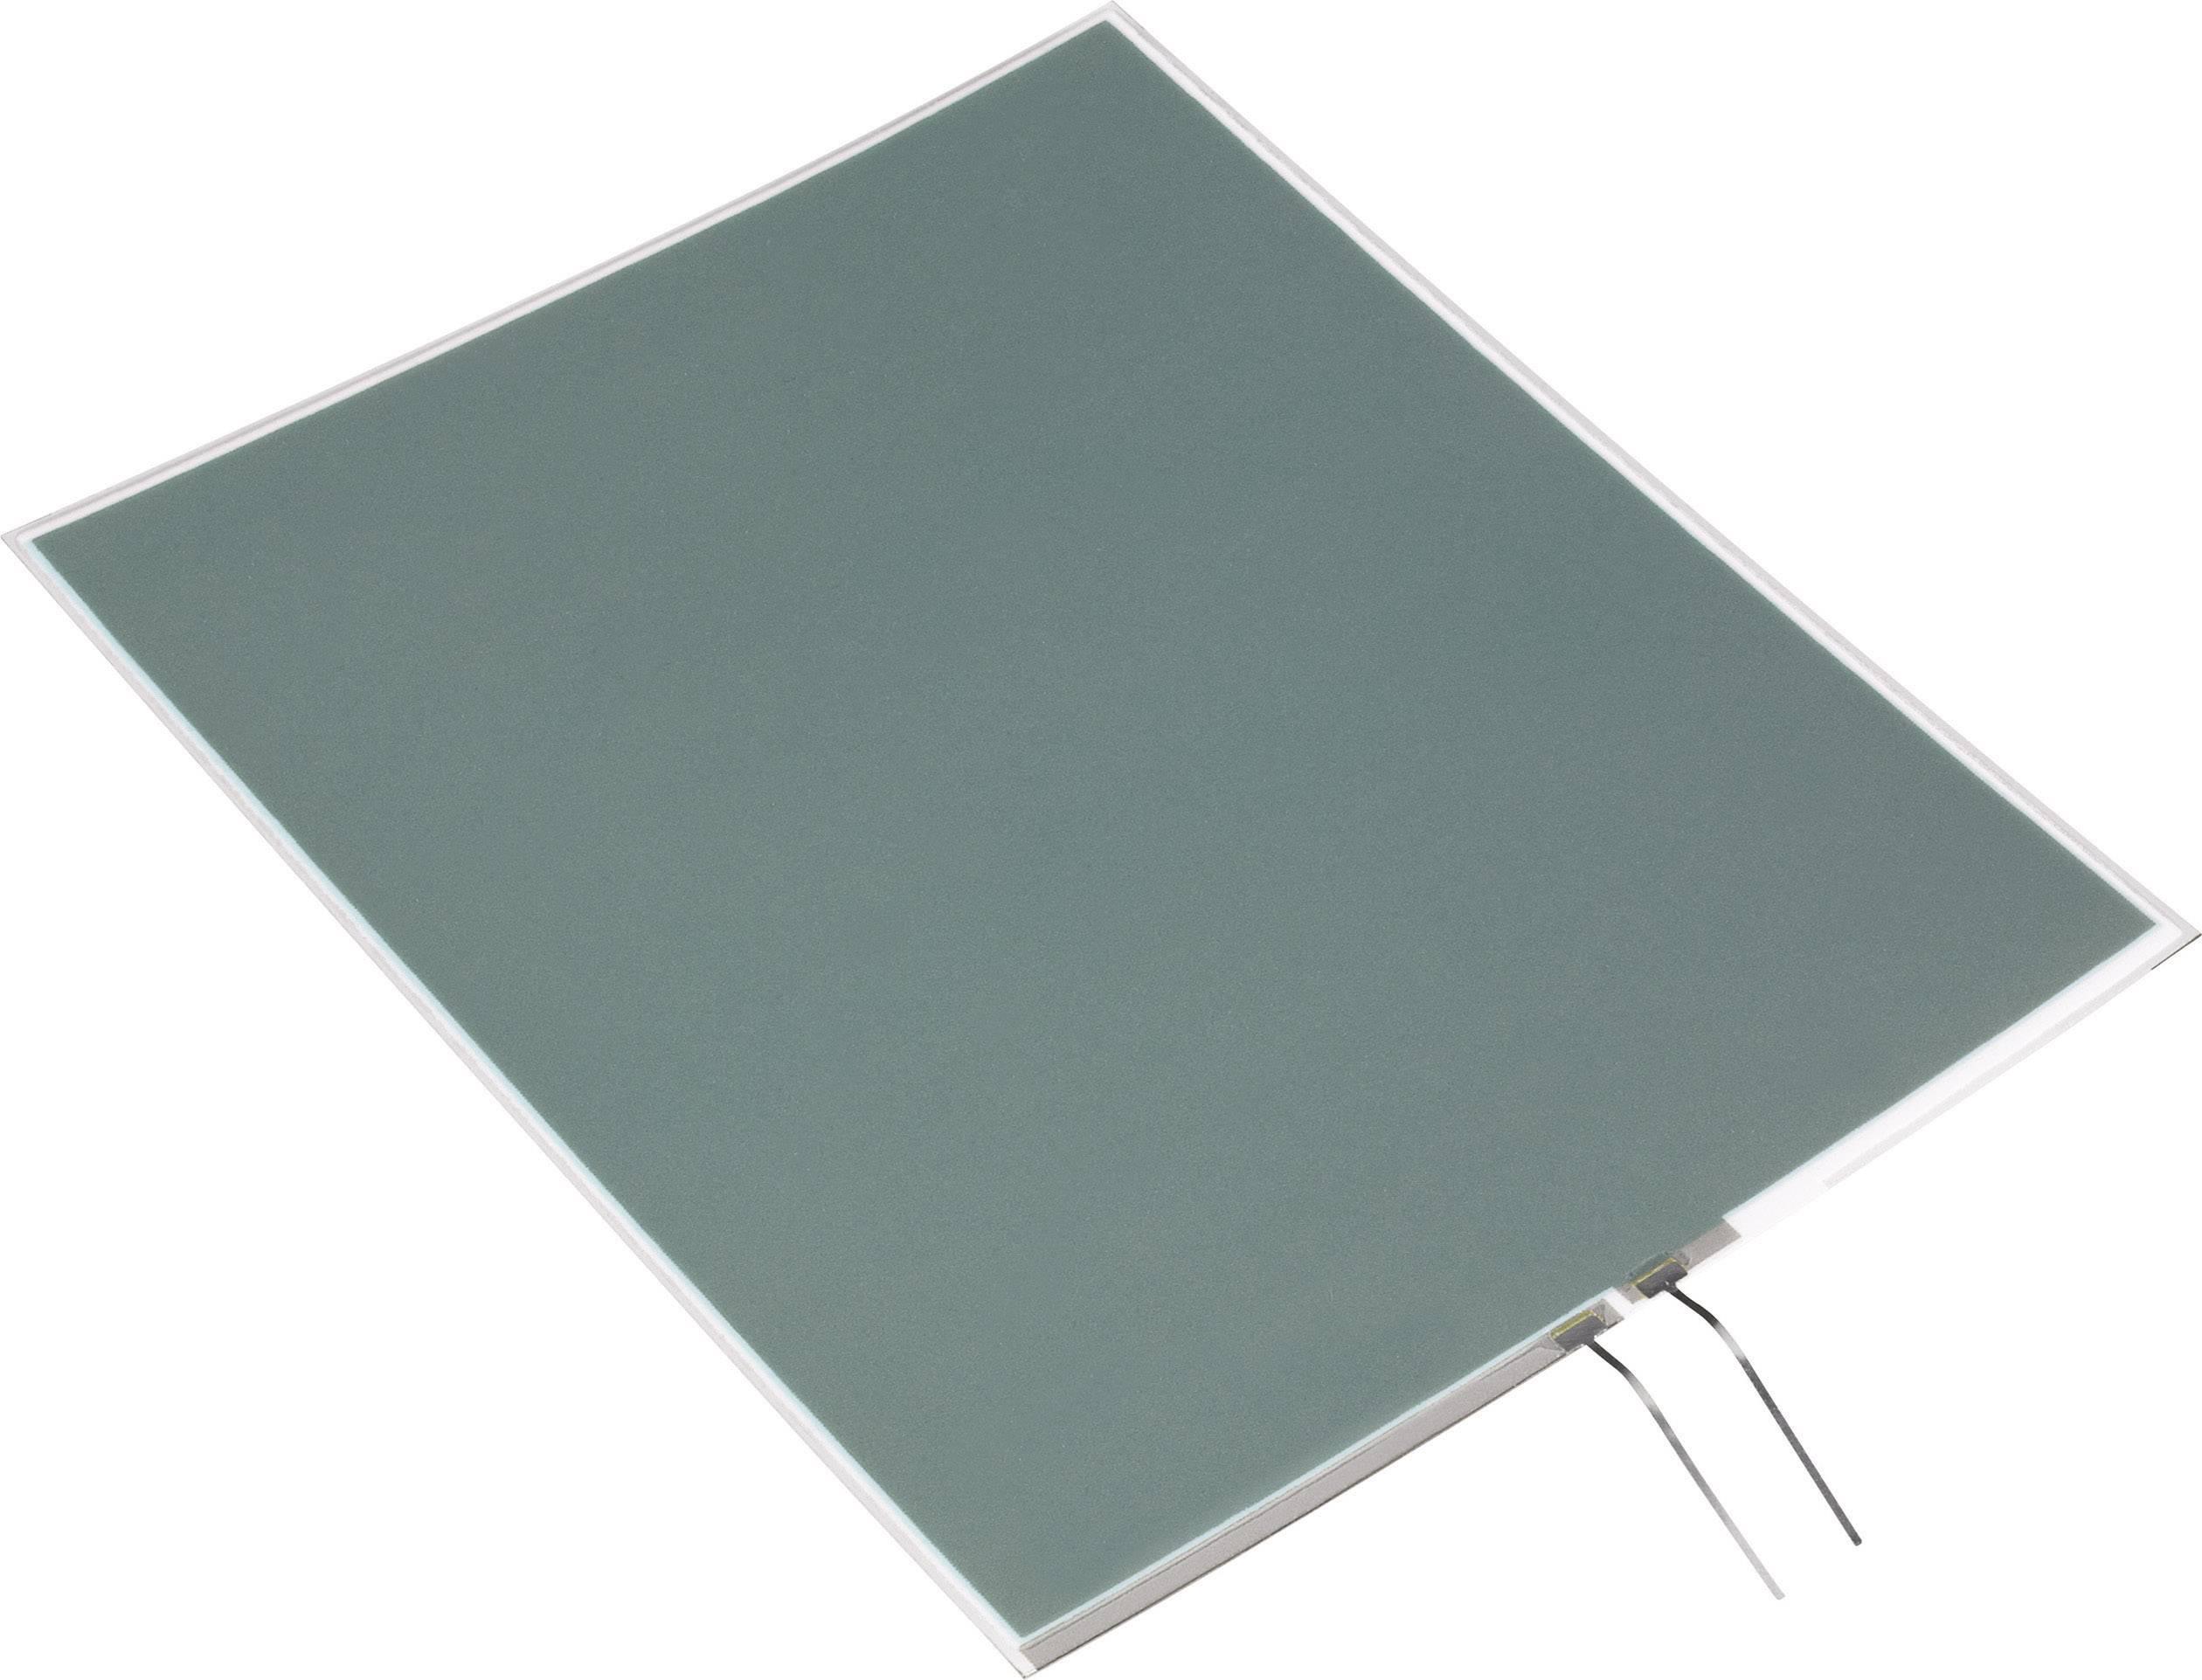 Svetelná fólia modrá, (d x š x v) 112 x 87 x 0.5 mm